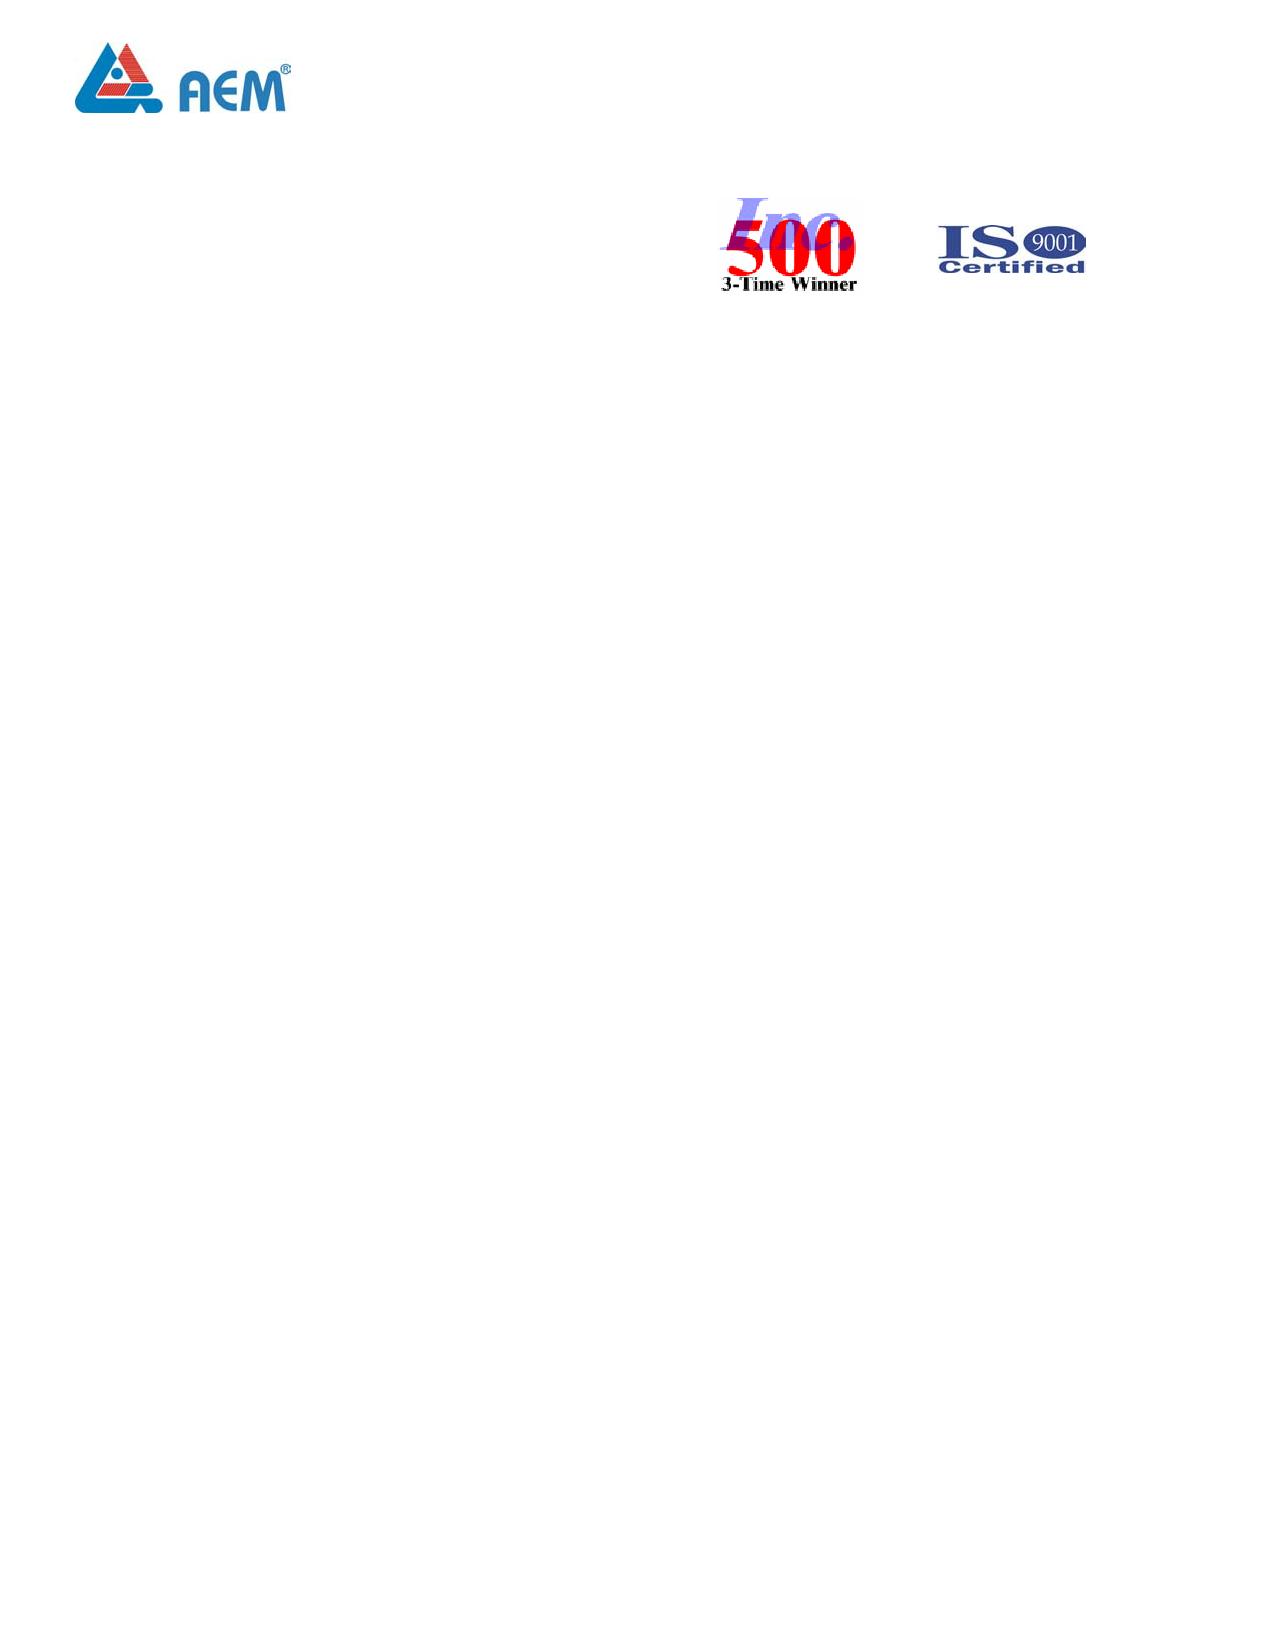 F0603FA3000V032T datasheet